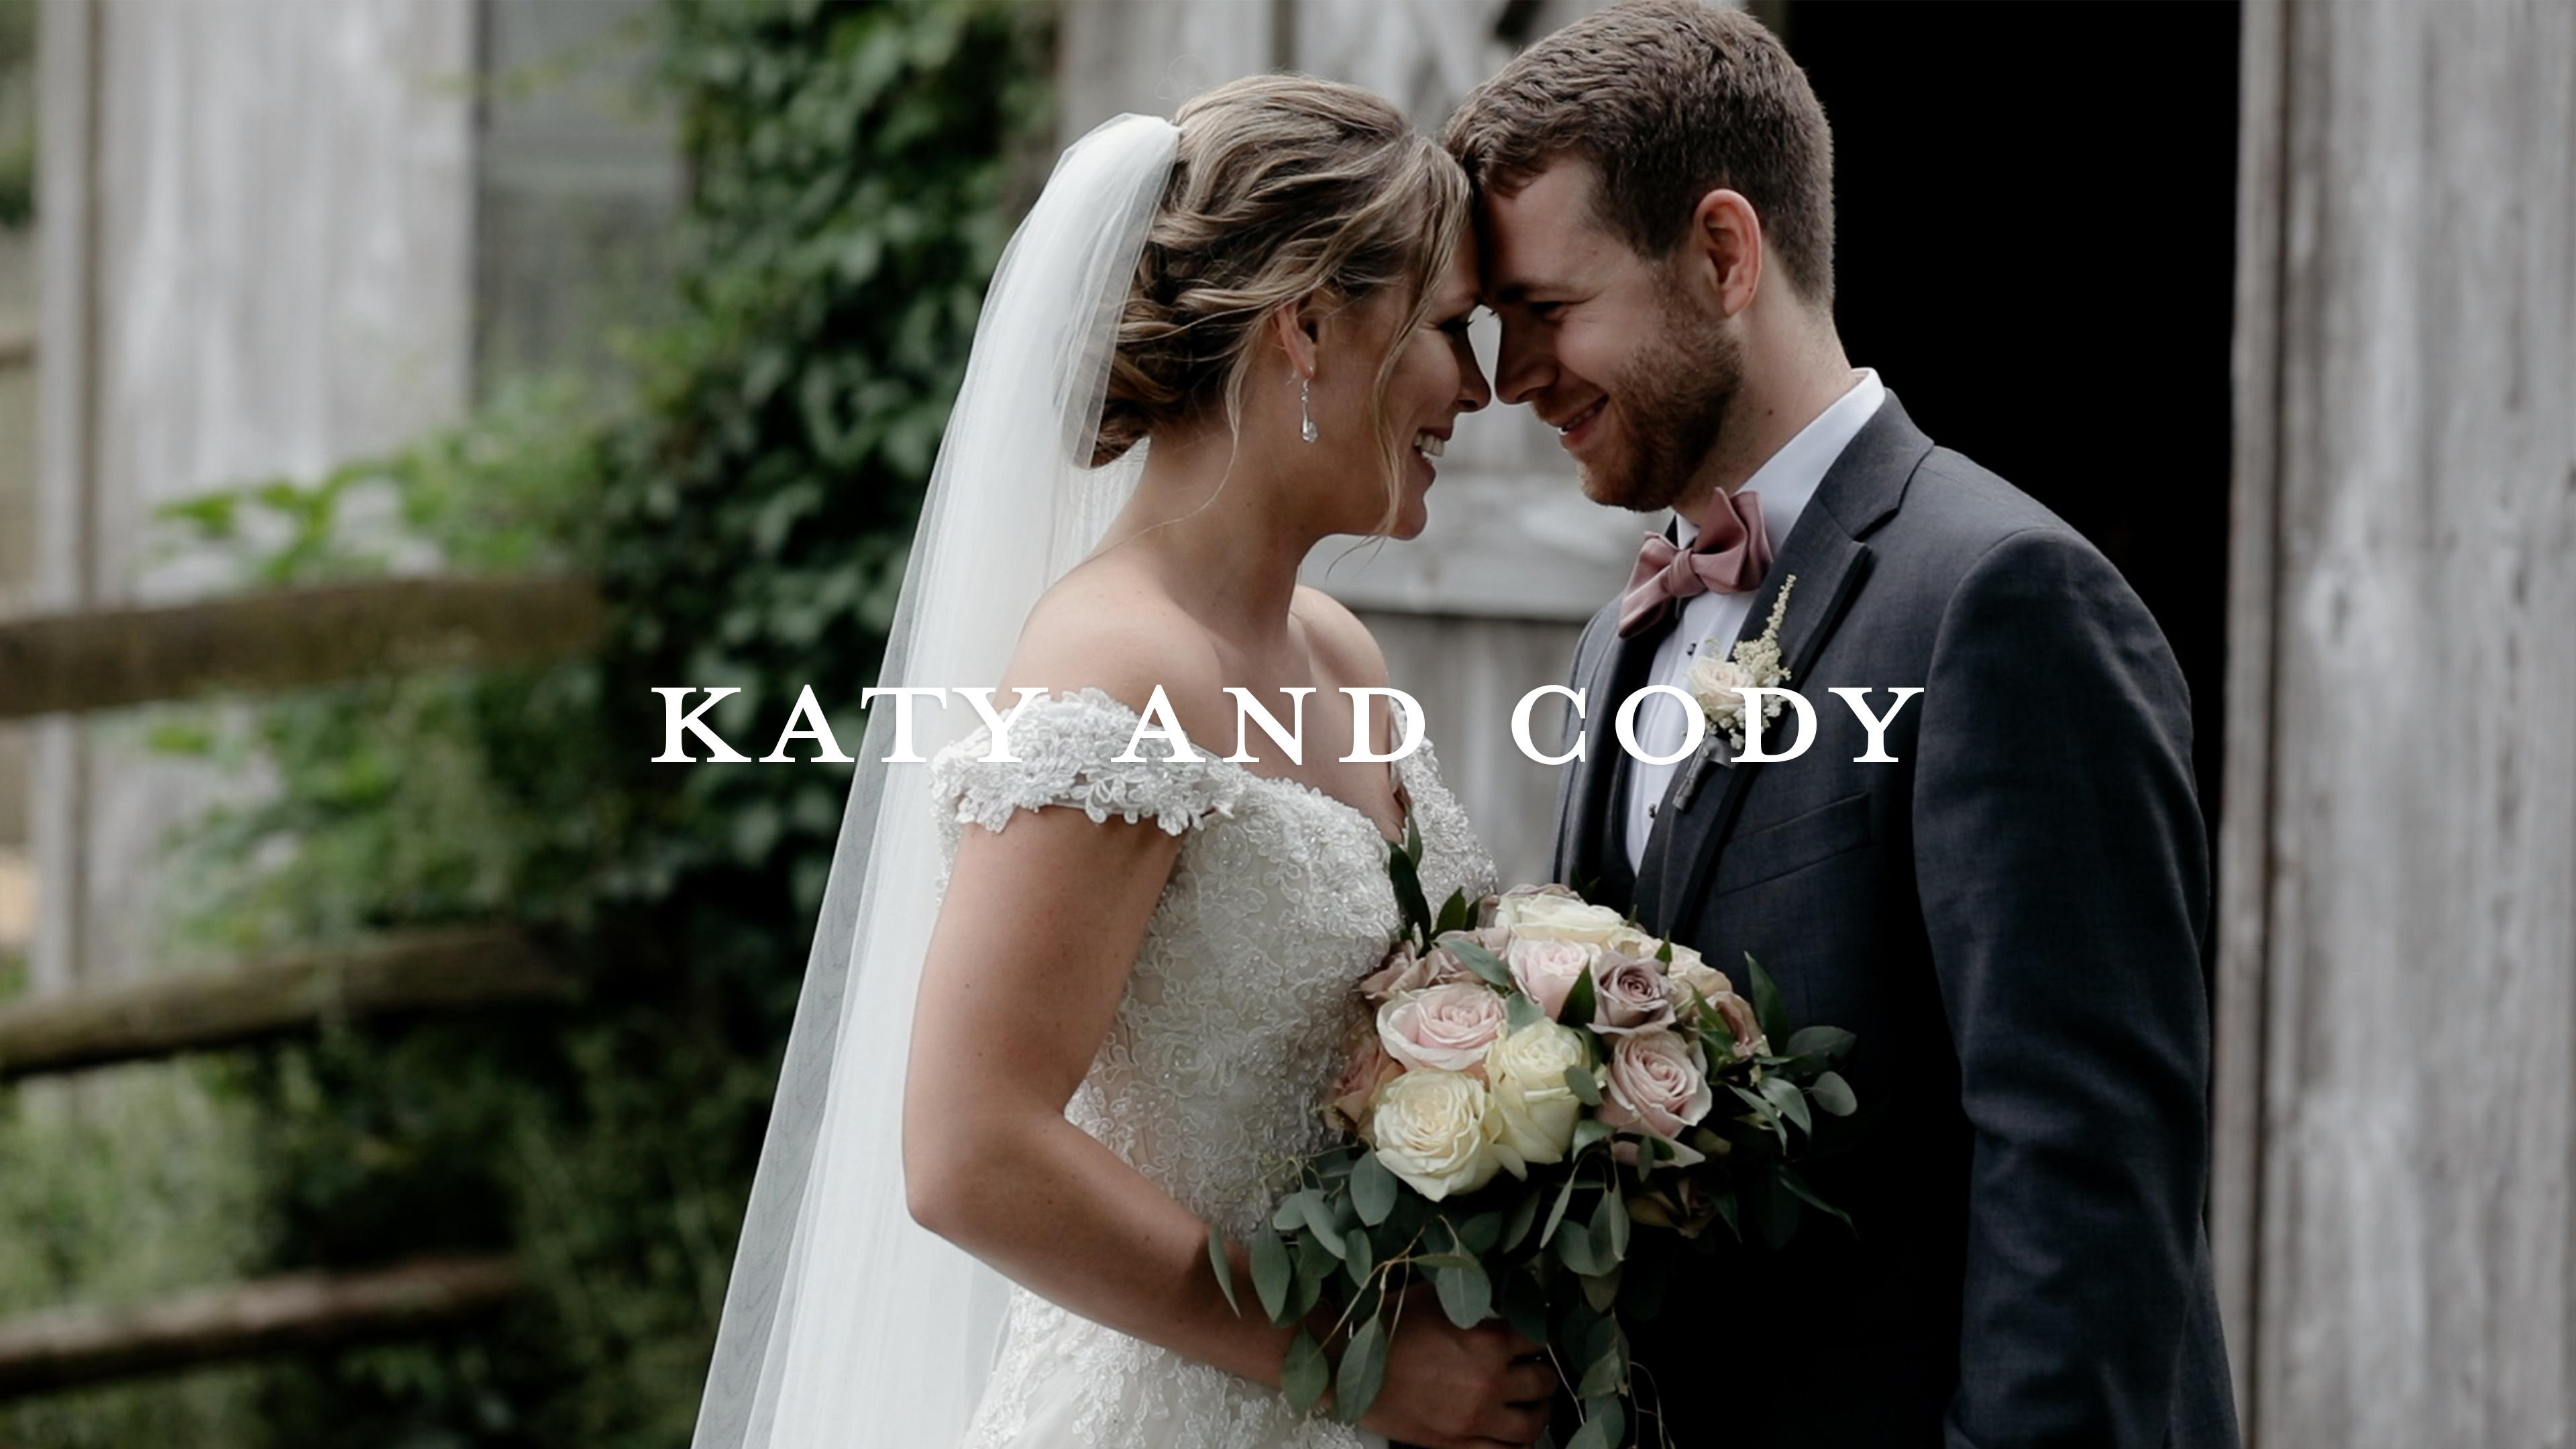 Katy + Cody | Plymouth, Massachusetts | Plimoth Plantation